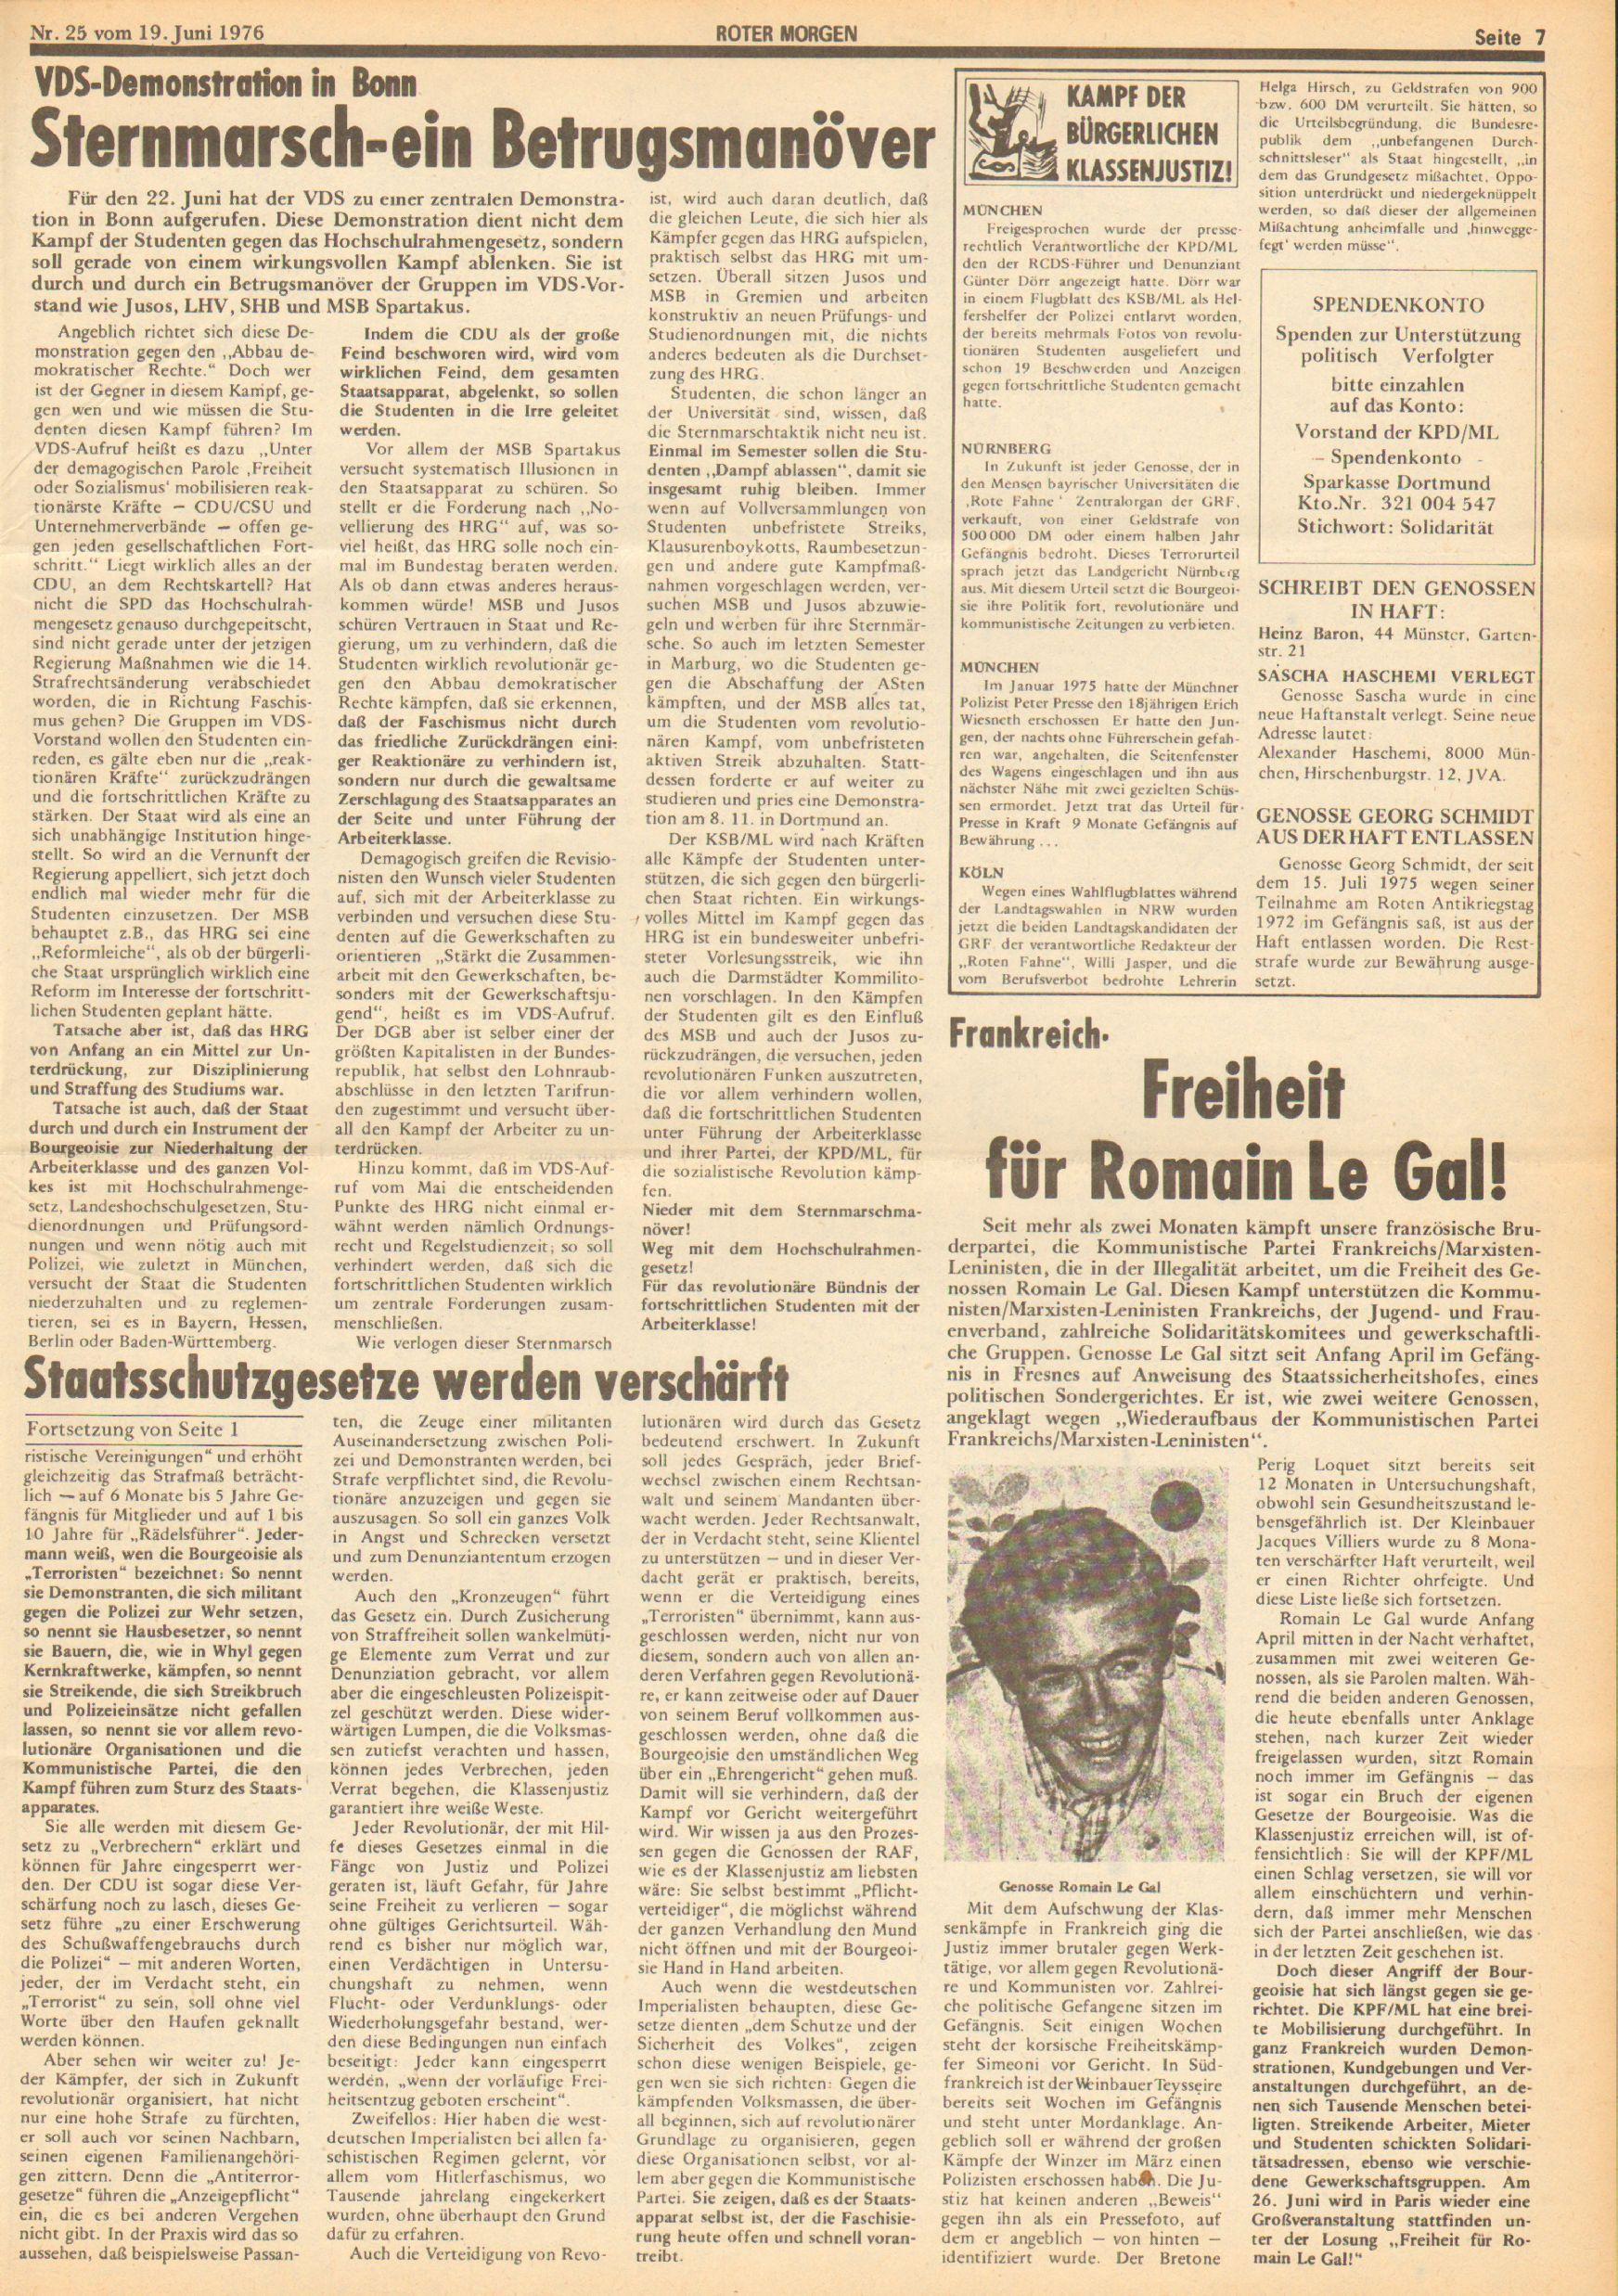 Roter Morgen, 10. Jg., 19. Juni 1976, Nr. 25, Seite 7